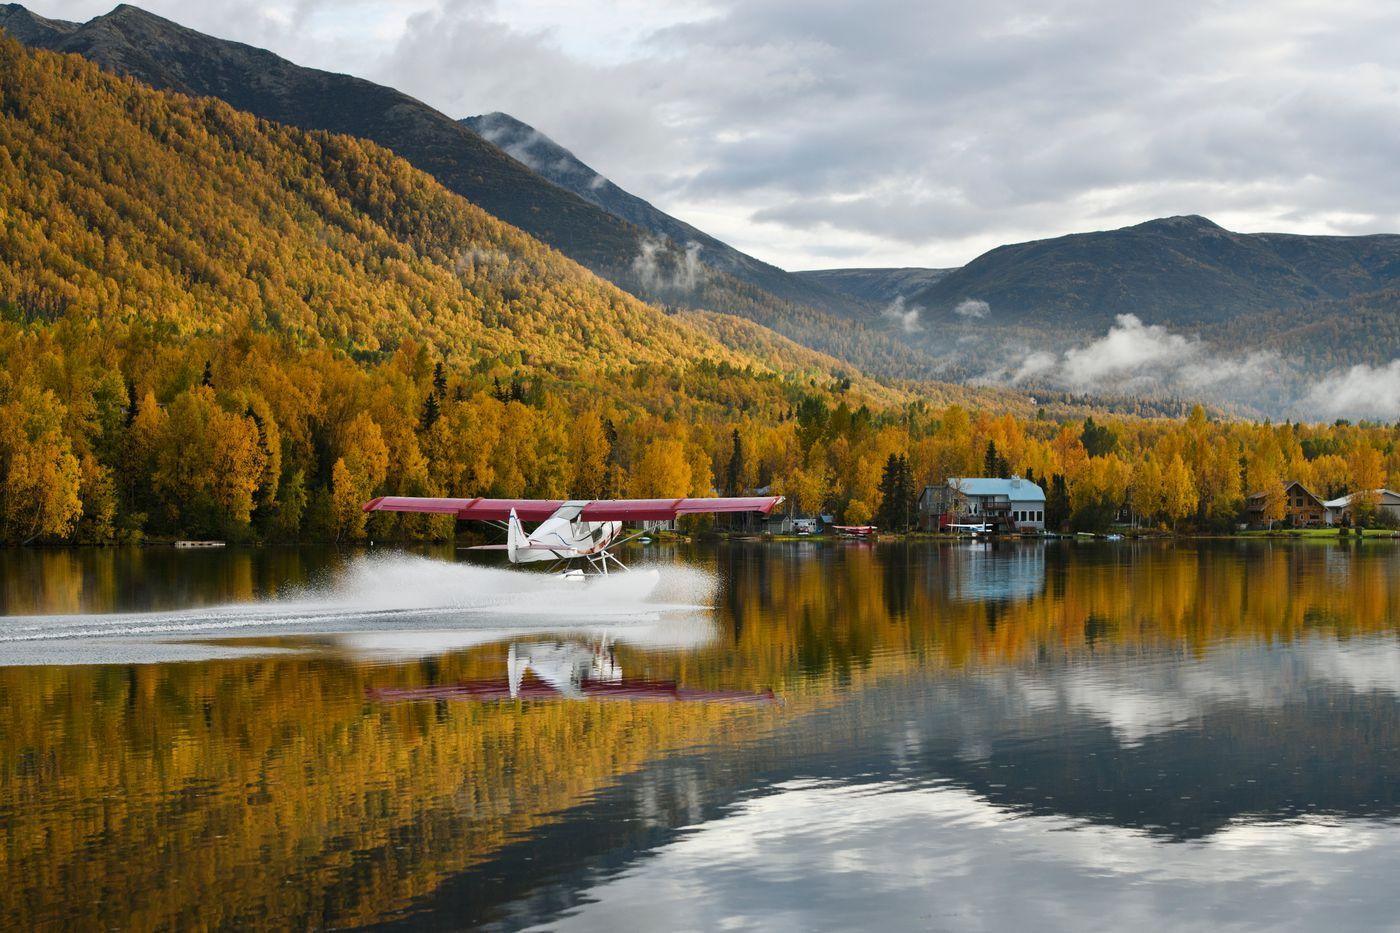 A plane on floats lands on Mirror Lake in Chugiak on September 25, 2020. (Marc Lester / ADN)